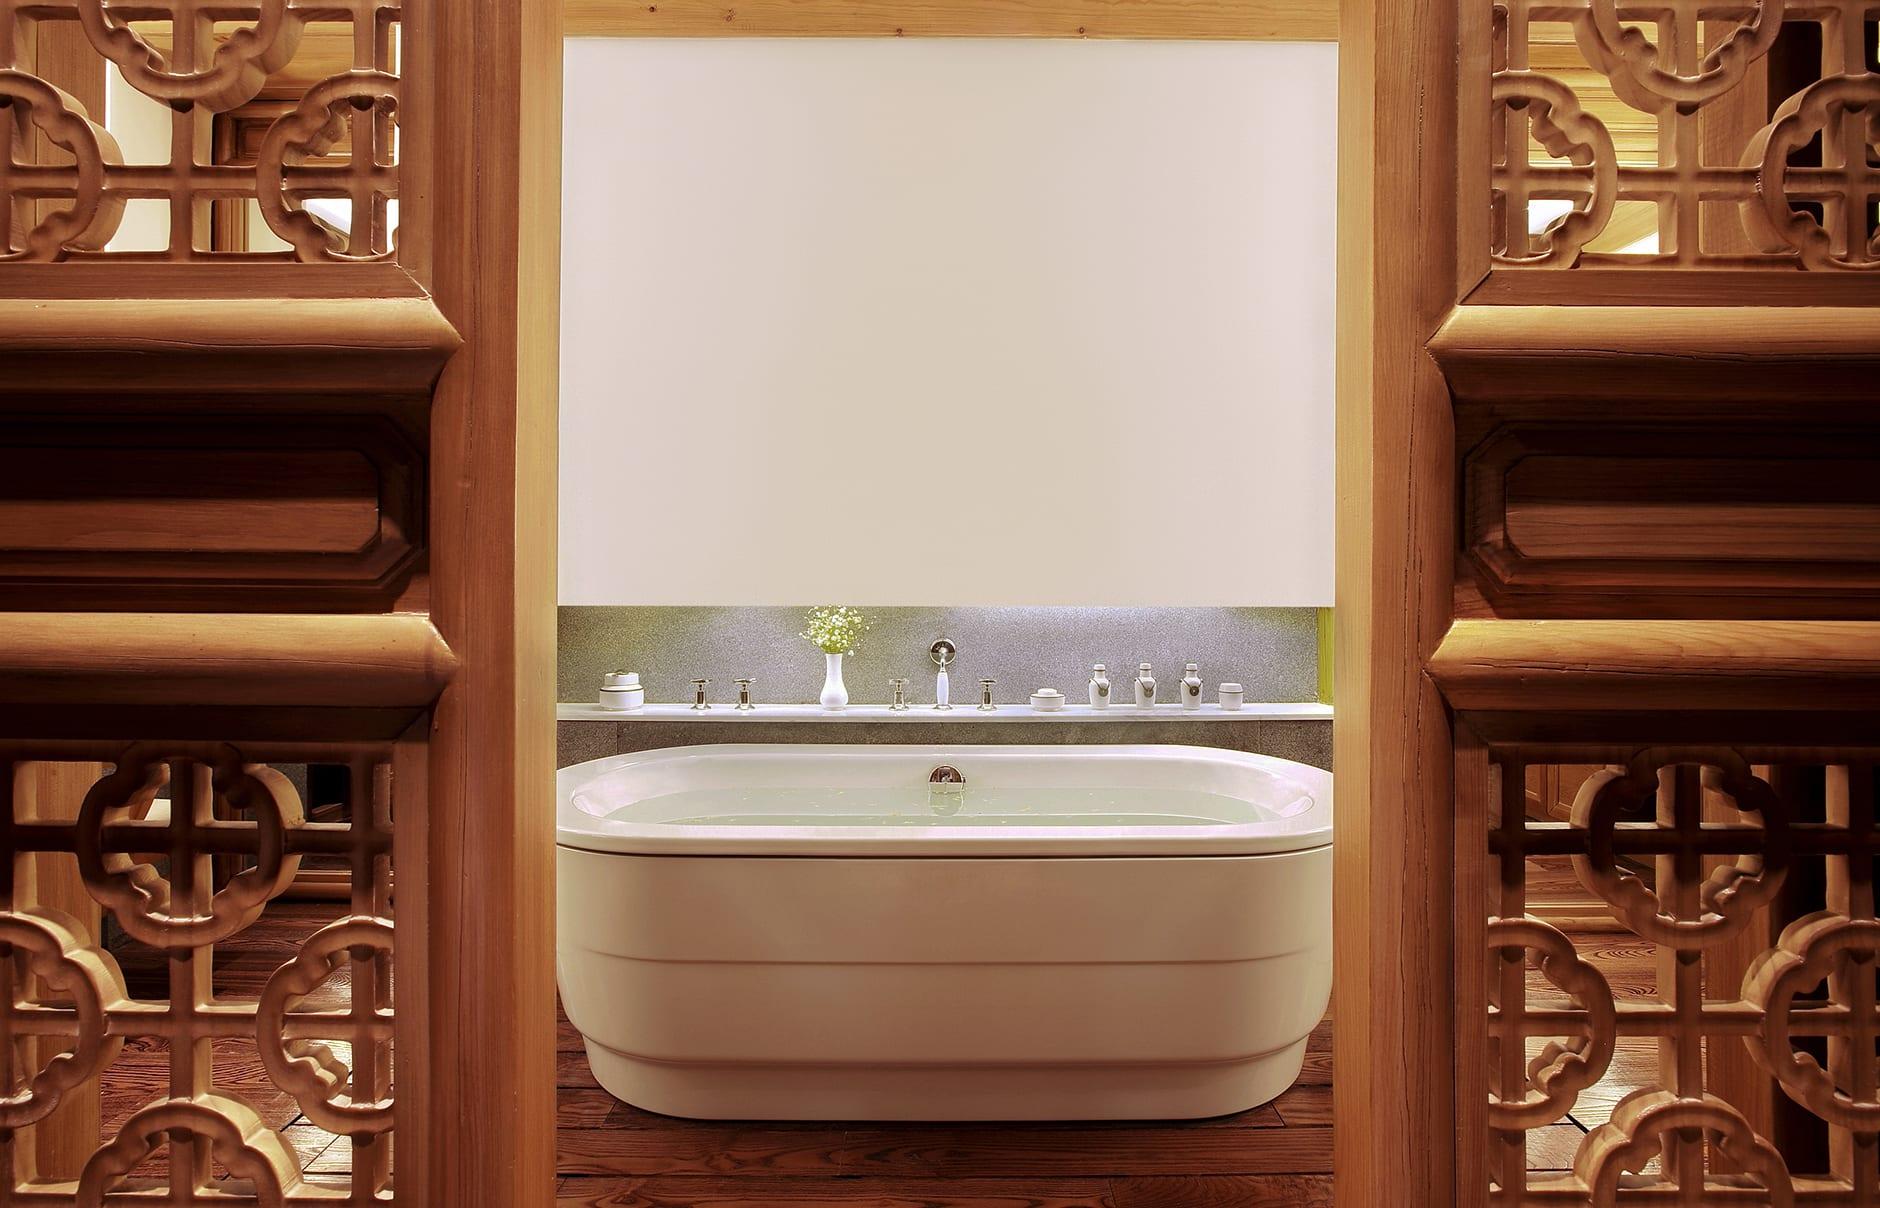 Amandayan - Deluxe Suite Bath. Amandayan, Lijiang, China. © Amanresorts